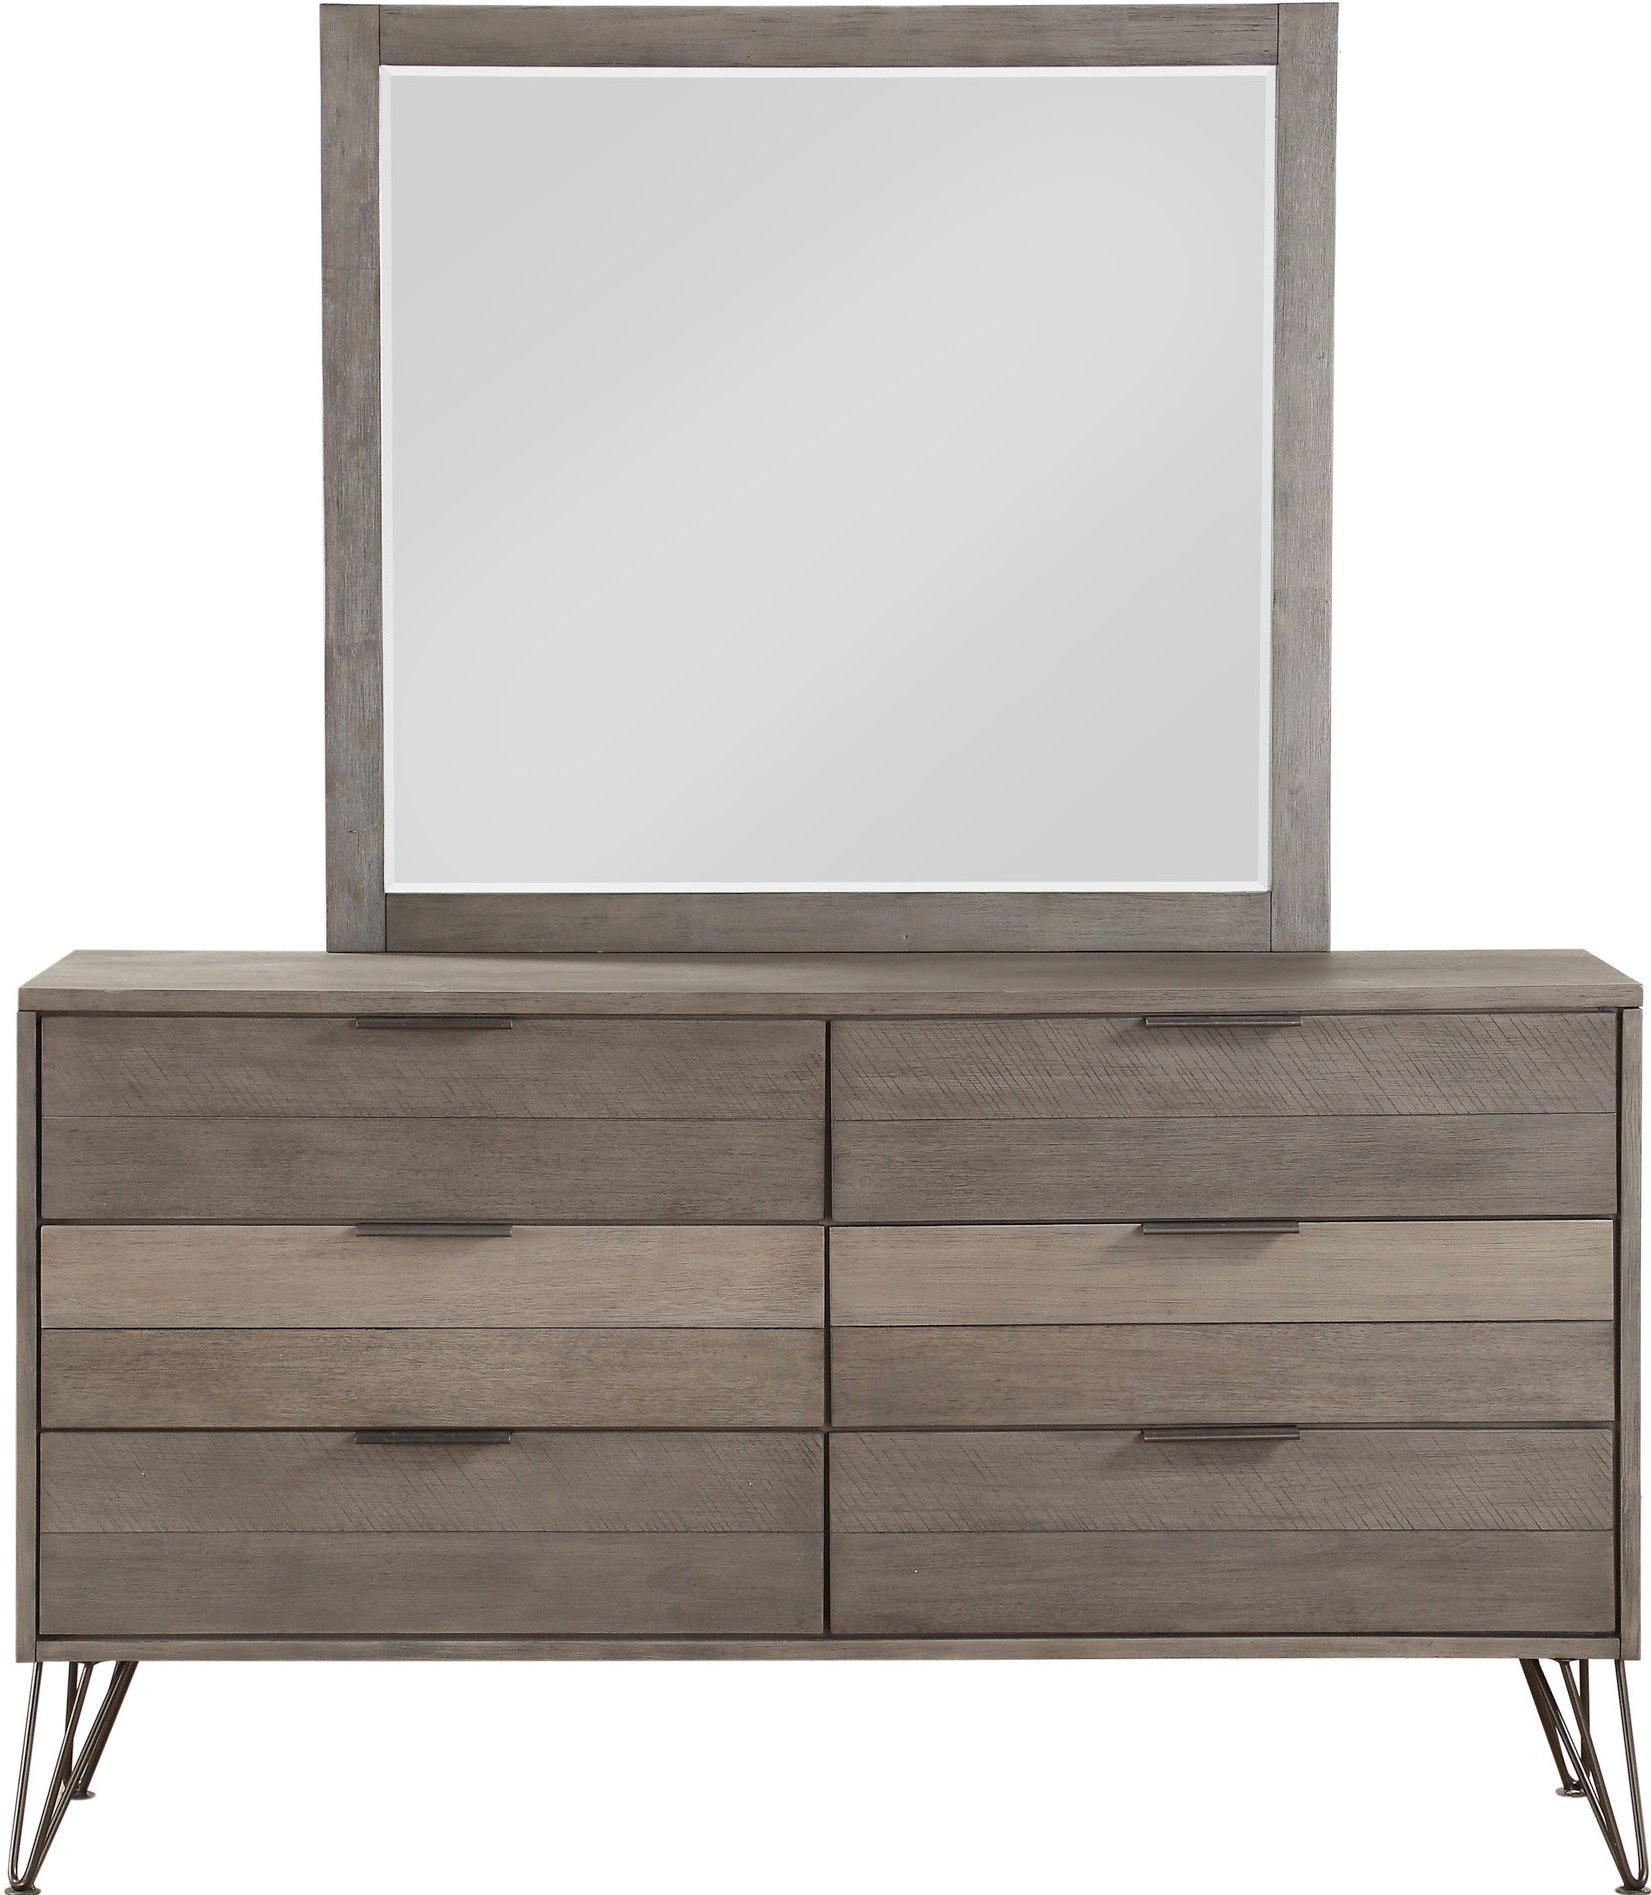 Modern industrial gray 6 piece king bedroom set urbanite - Industrial bedroom furniture sets ...